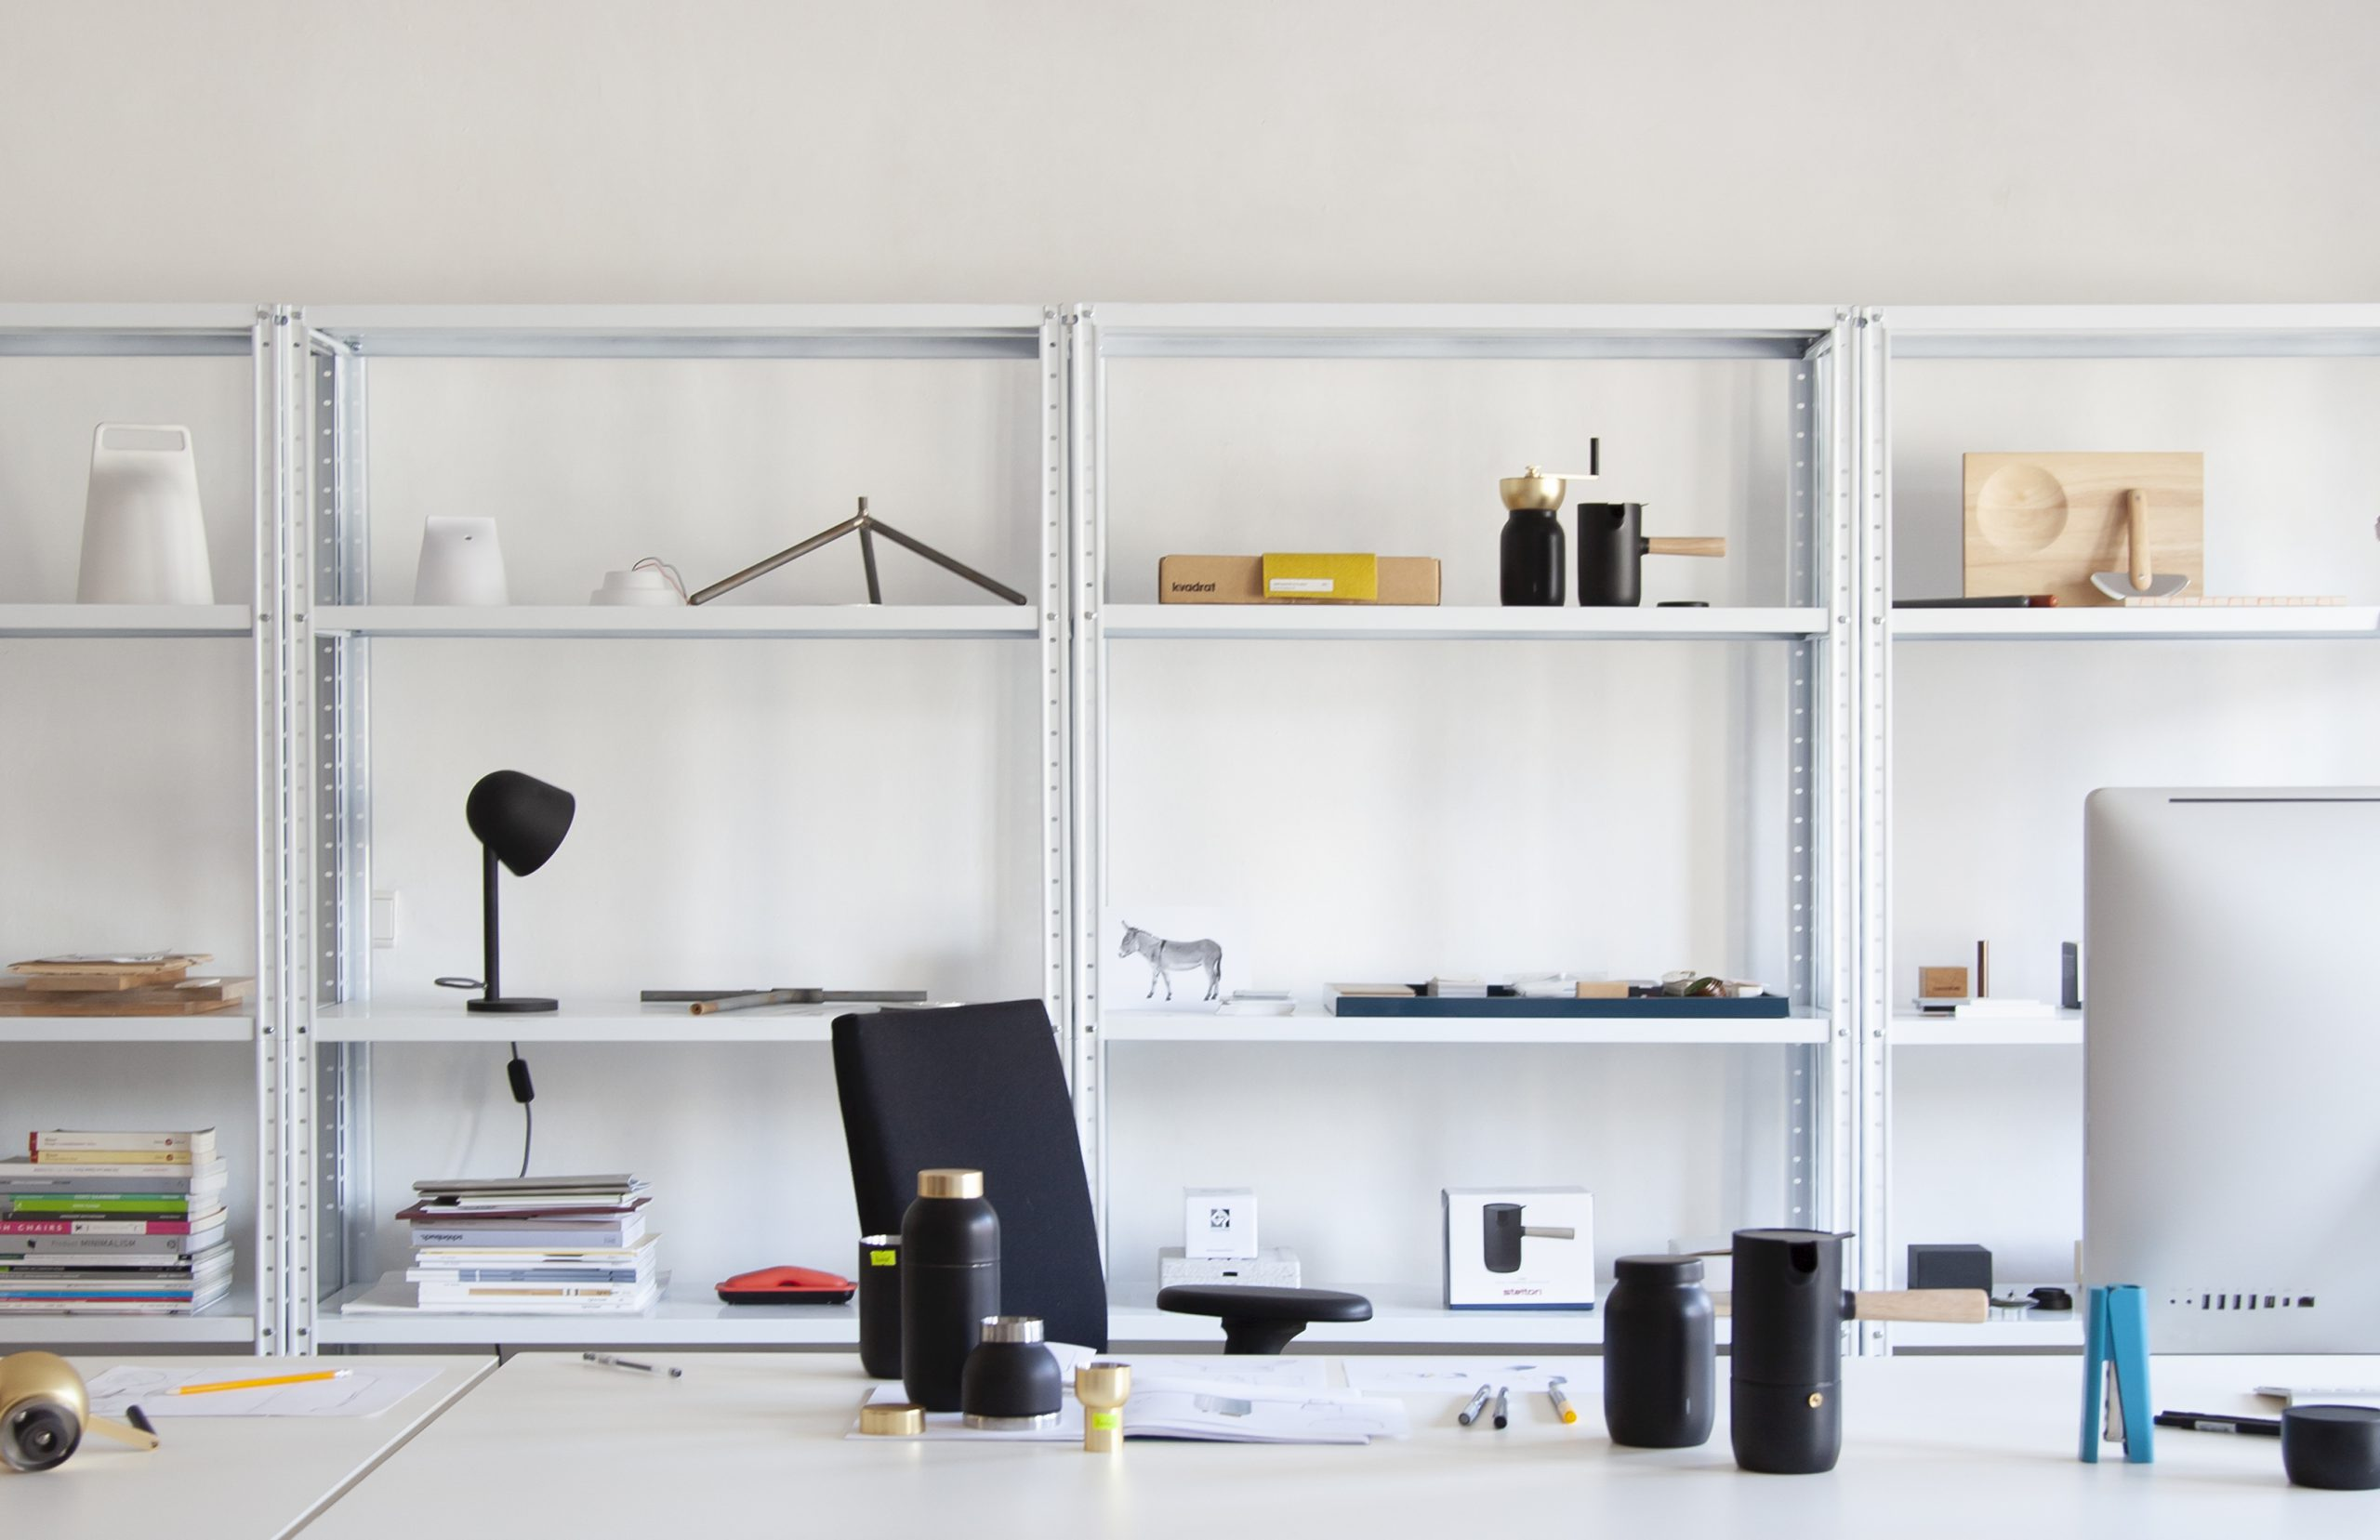 Debiasi Sandri Studio space